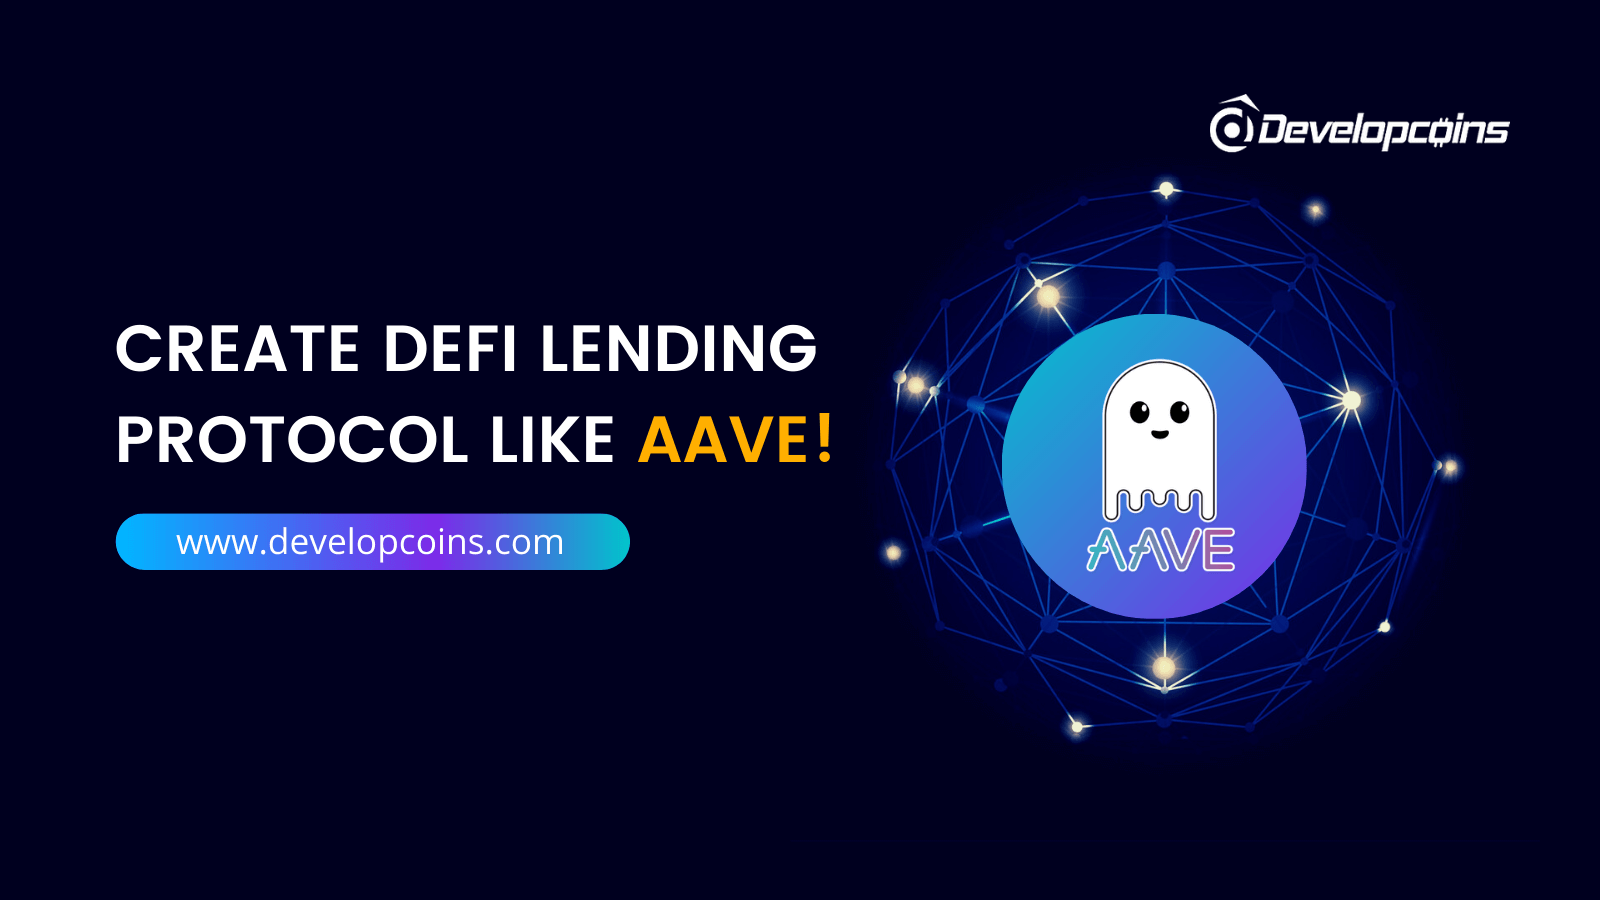 DeFi Lending Protocol Development - Create DeFi Lending Protocol Like AAVE!